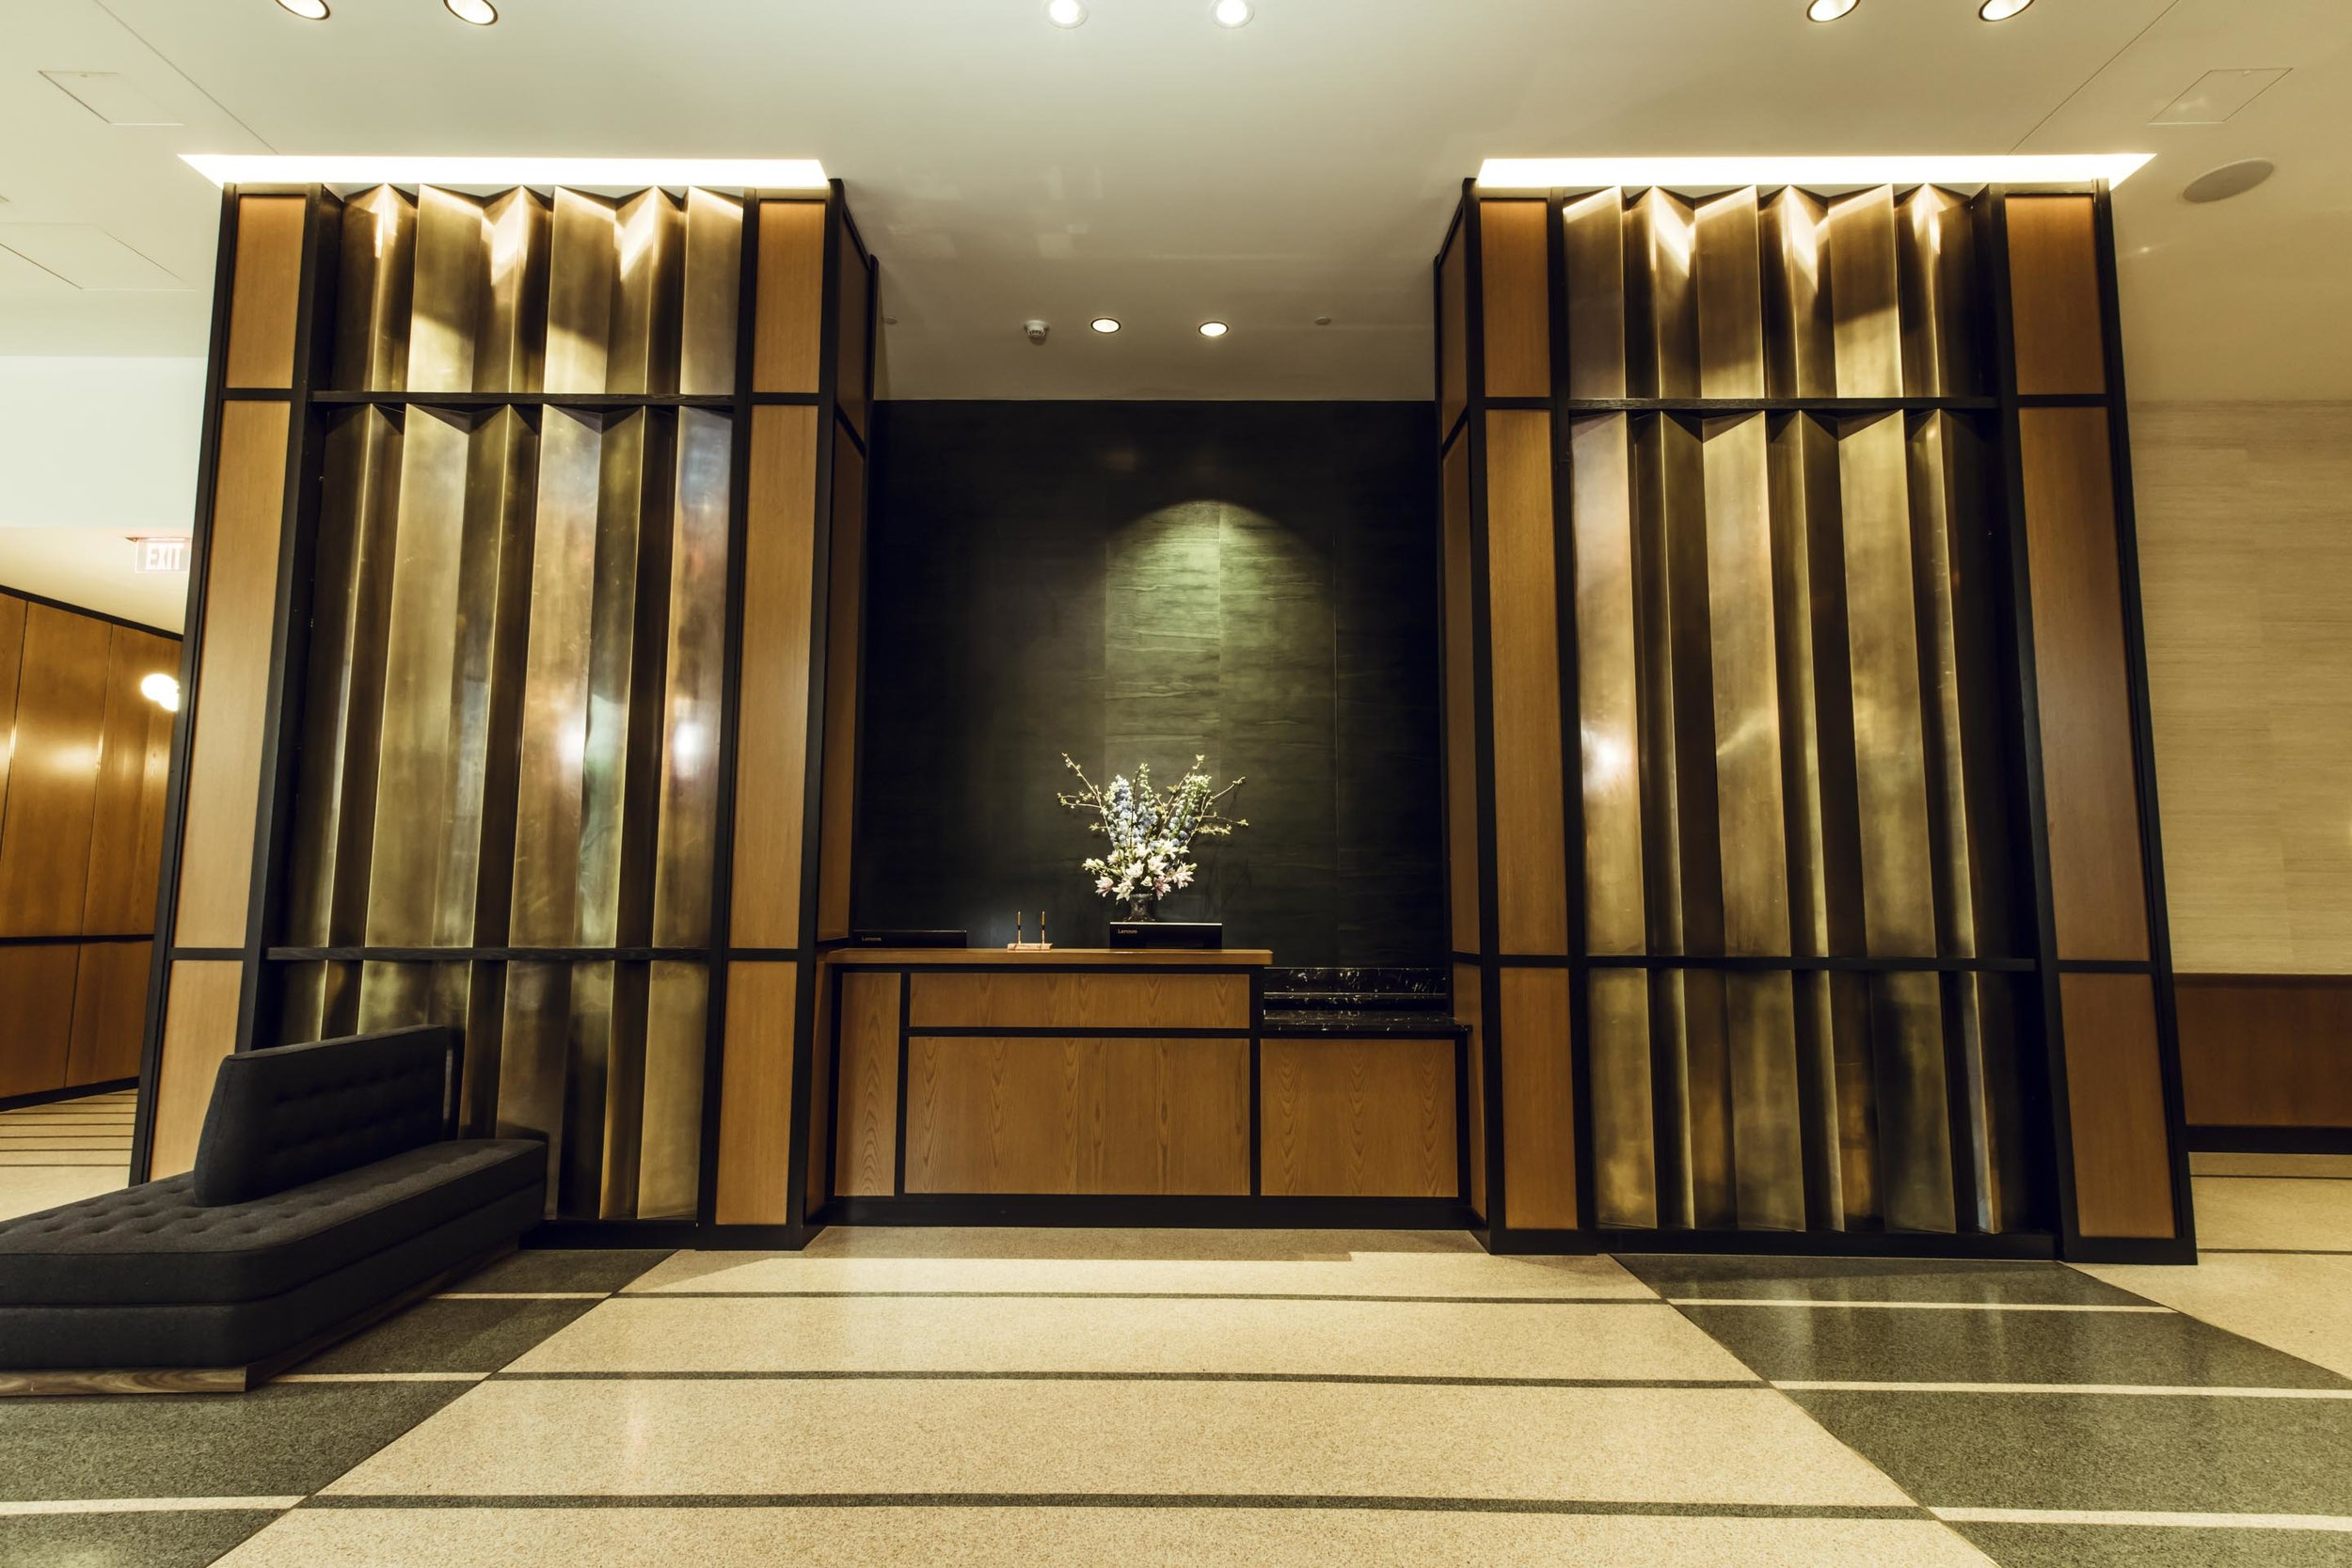 FAIRLANE HOTEL ARCHITECTURE WEB RES-5.jpg